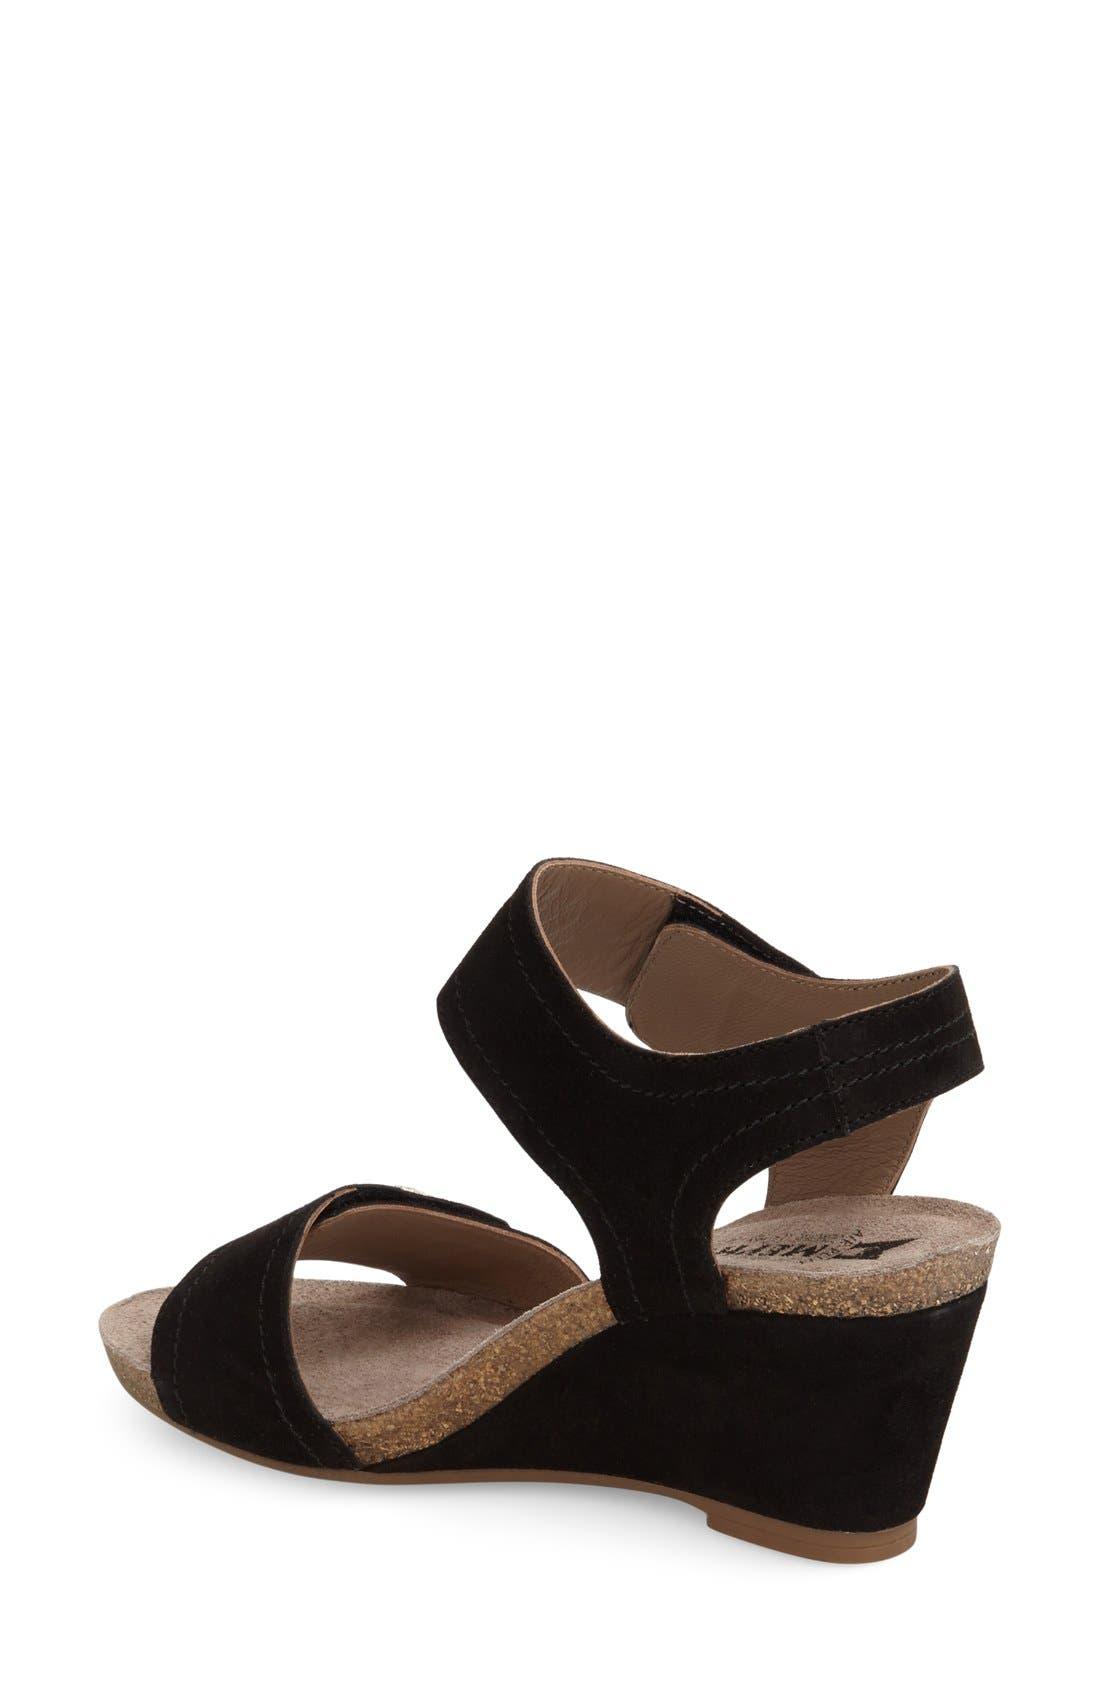 'Jackie' Wedge Sandal,                             Alternate thumbnail 6, color,                             BLACK PREMIUM SUEDE